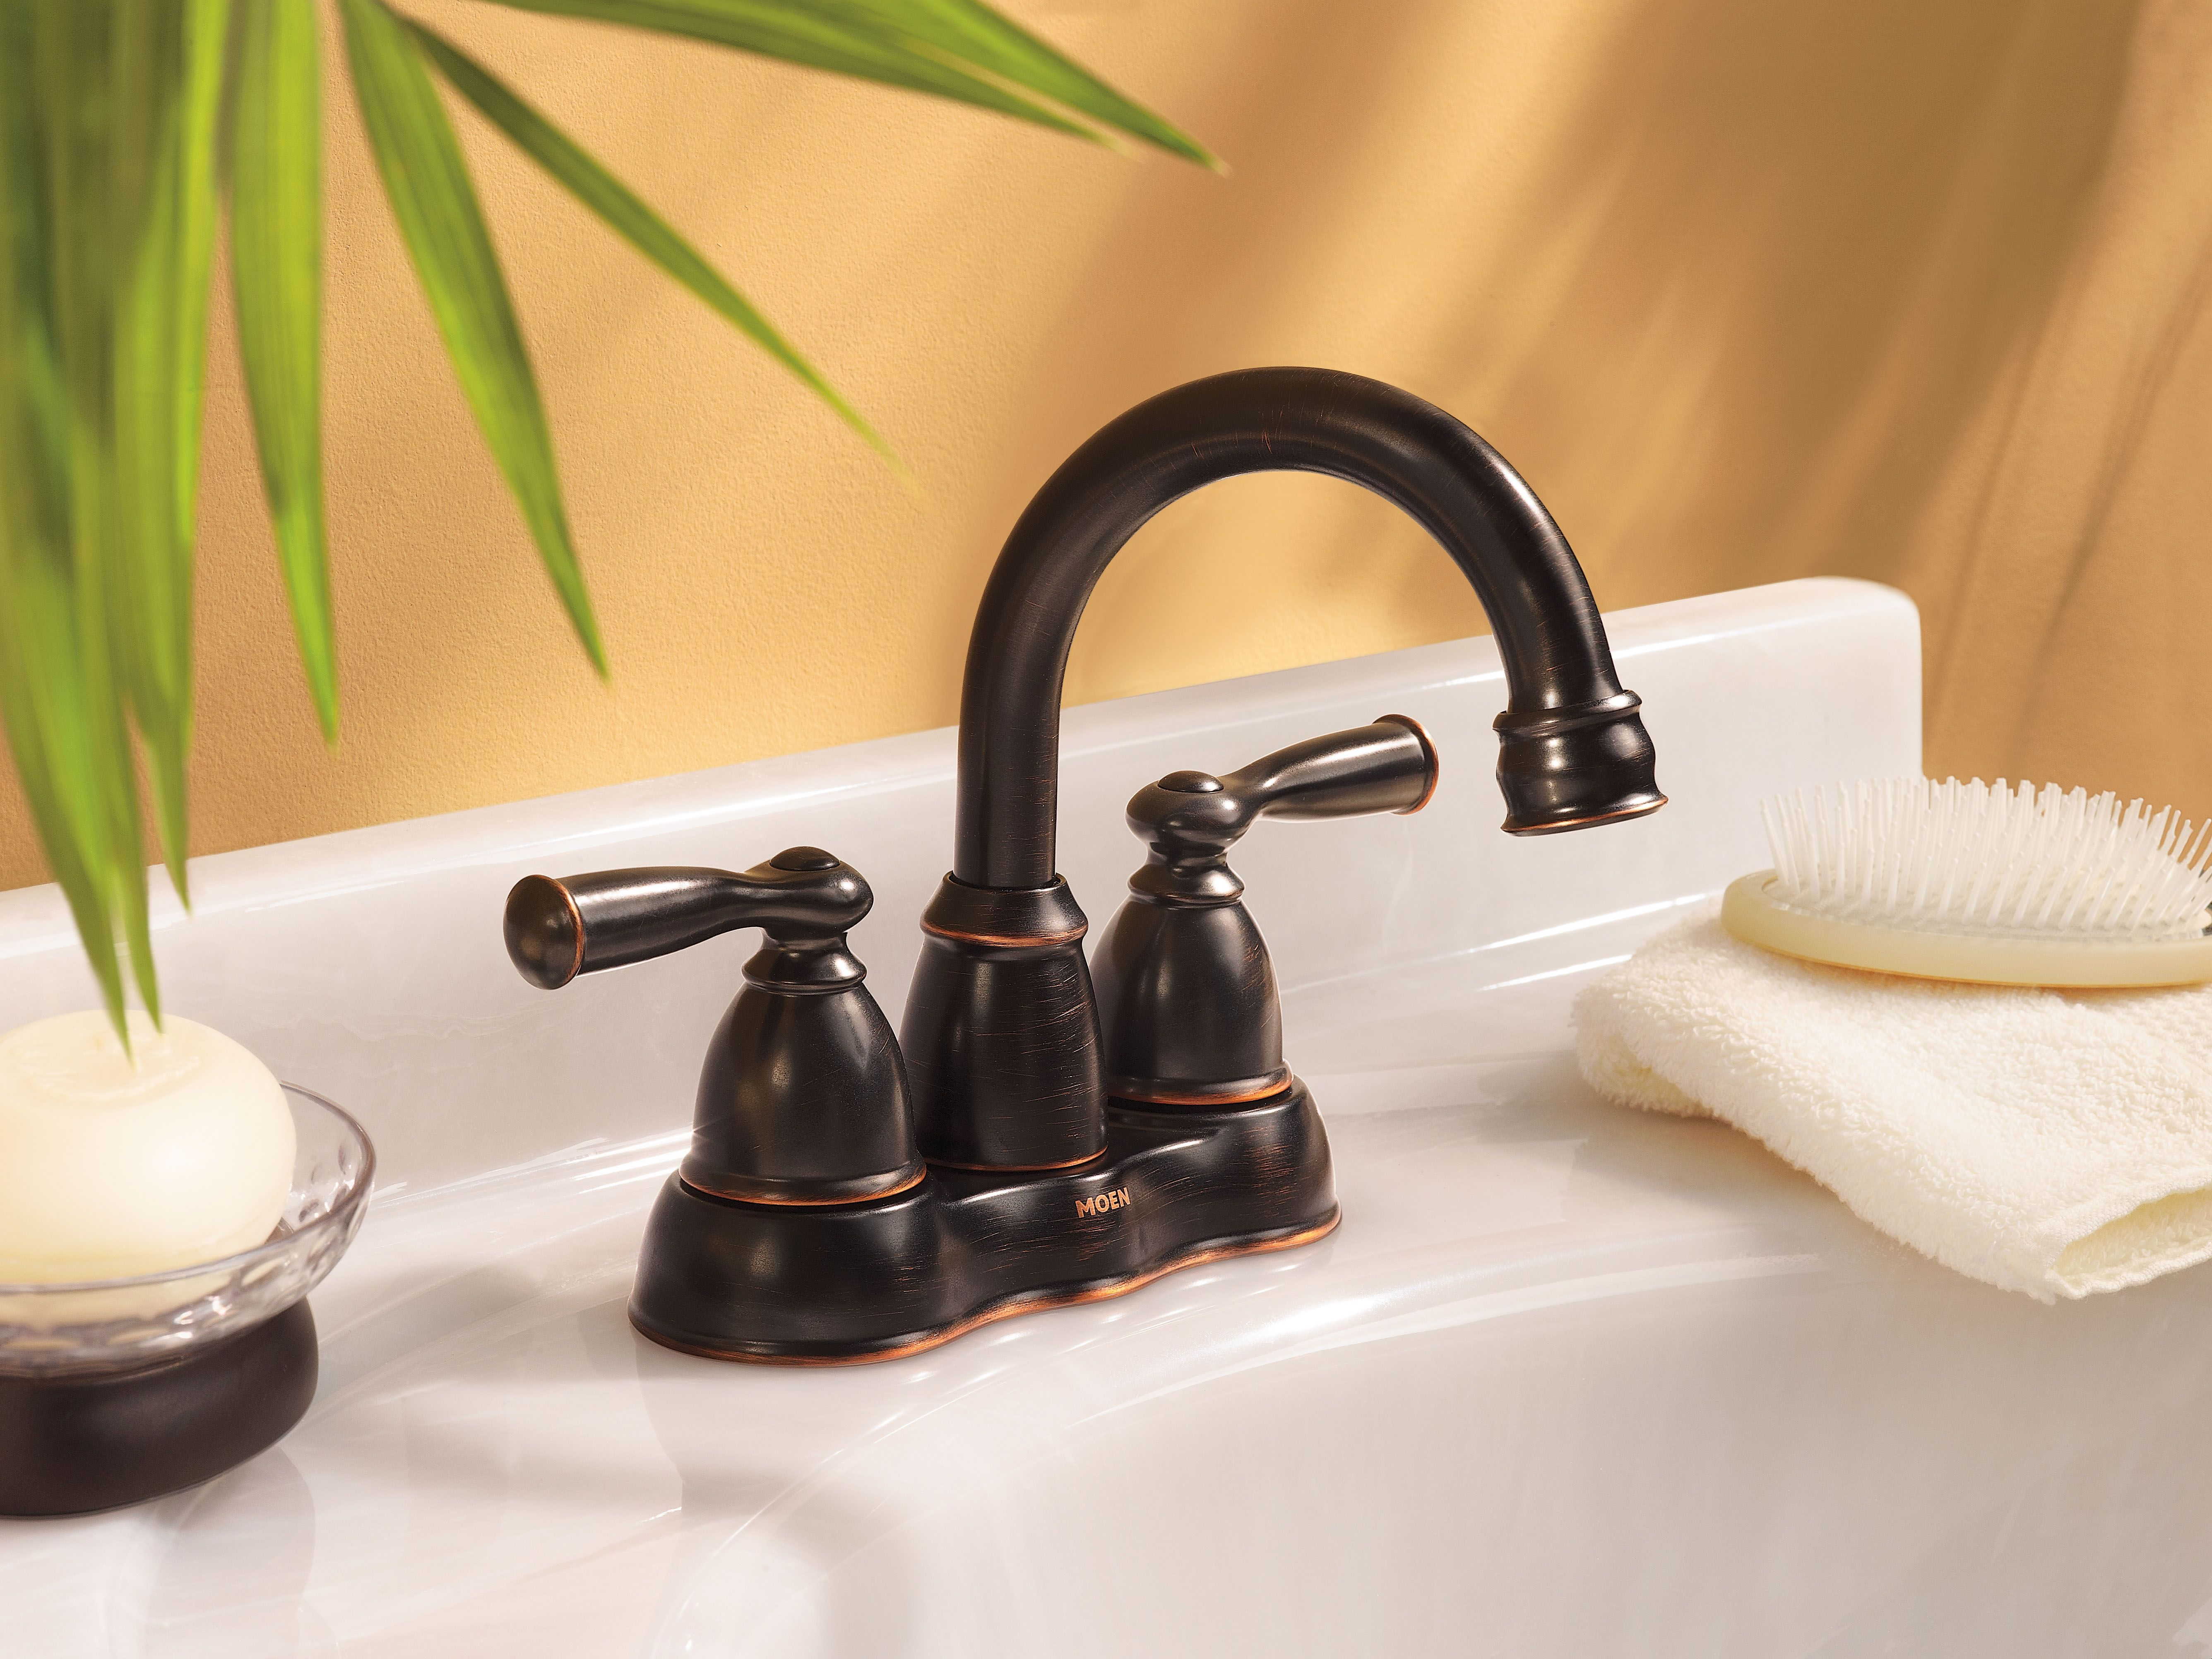 Banbury Bathroom Faucet High Arc Bathroom Faucet Low Arc Bathroom Faucet Bathroom Faucets [ 4008 x 5344 Pixel ]